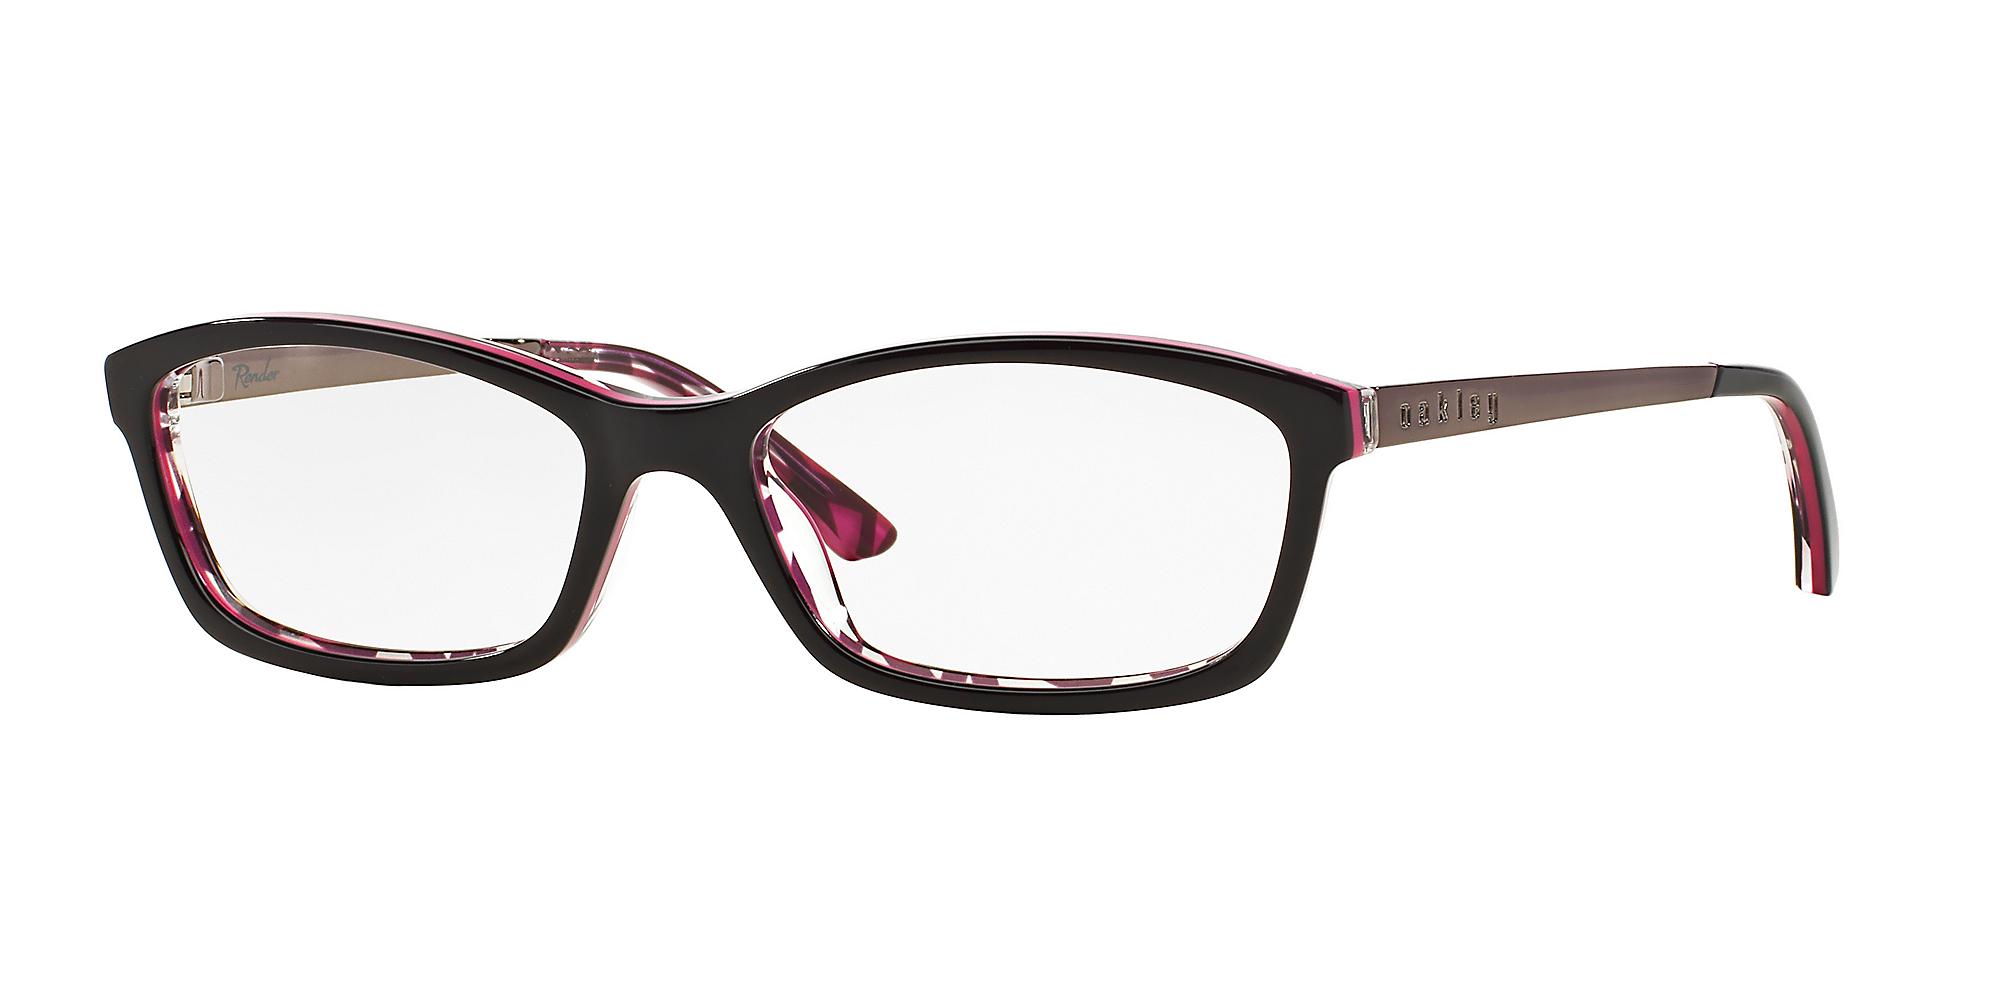 4e4c8f1b68 Oakley Glasses Frames Womens « One More Soul